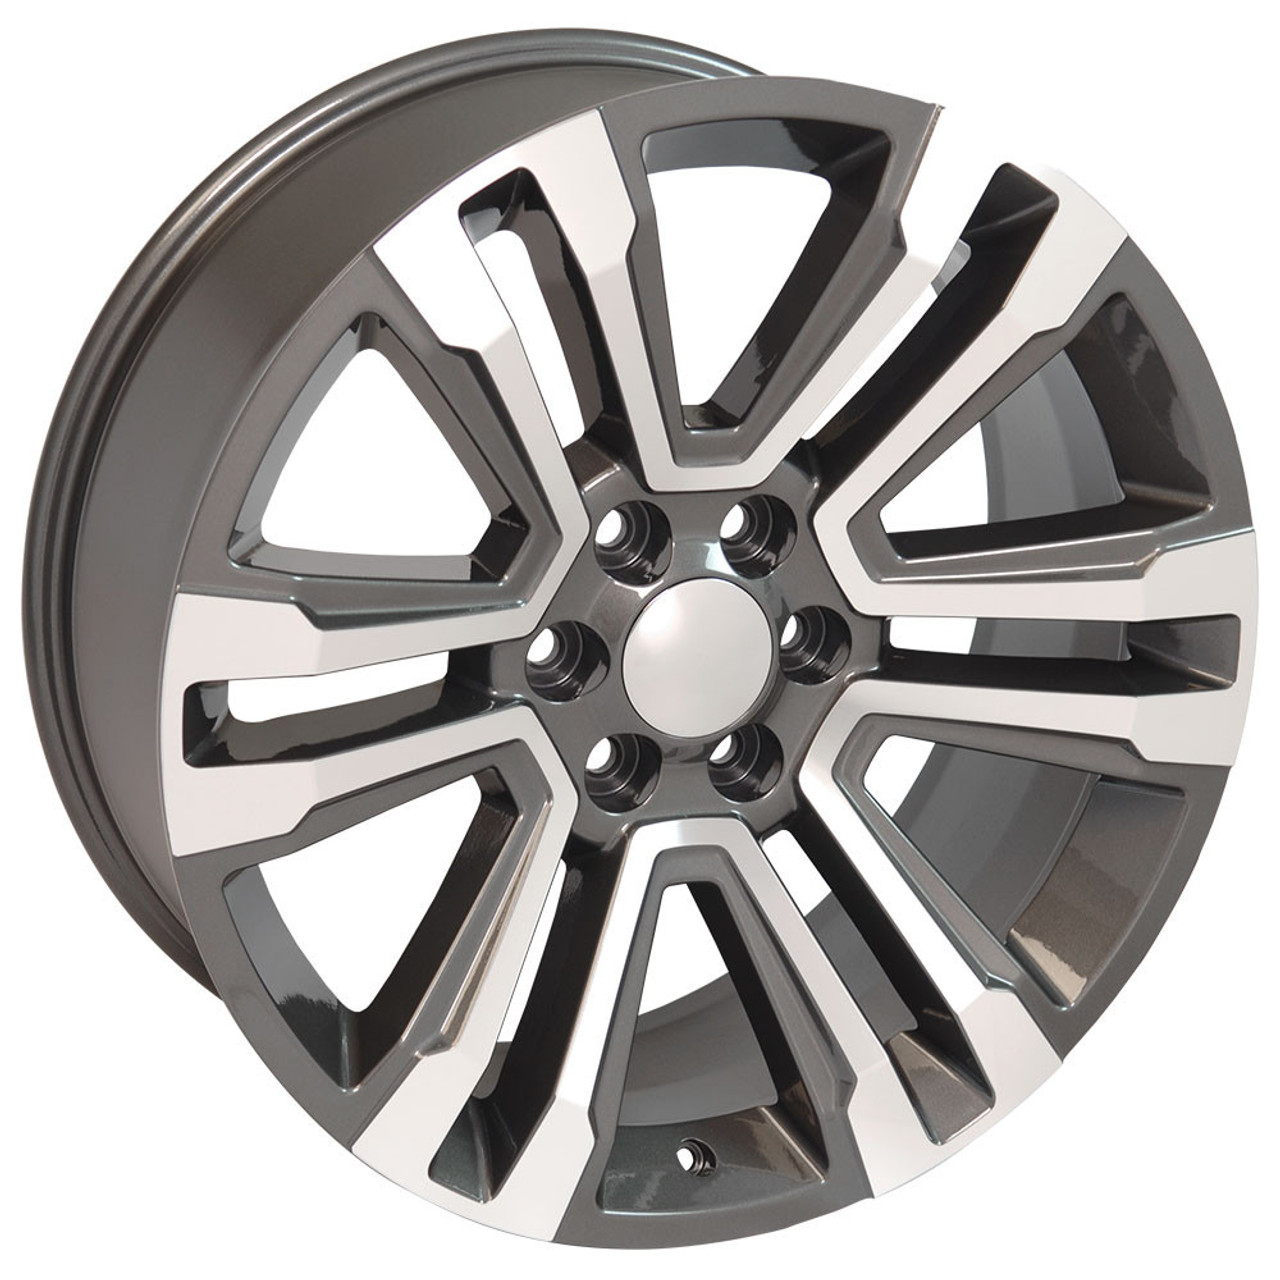 "Hyper Silver and Machine 22"" Denali Style Split Spoke Wheels for Chevy Silverado, Tahoe, Suburban - New Set of 4"